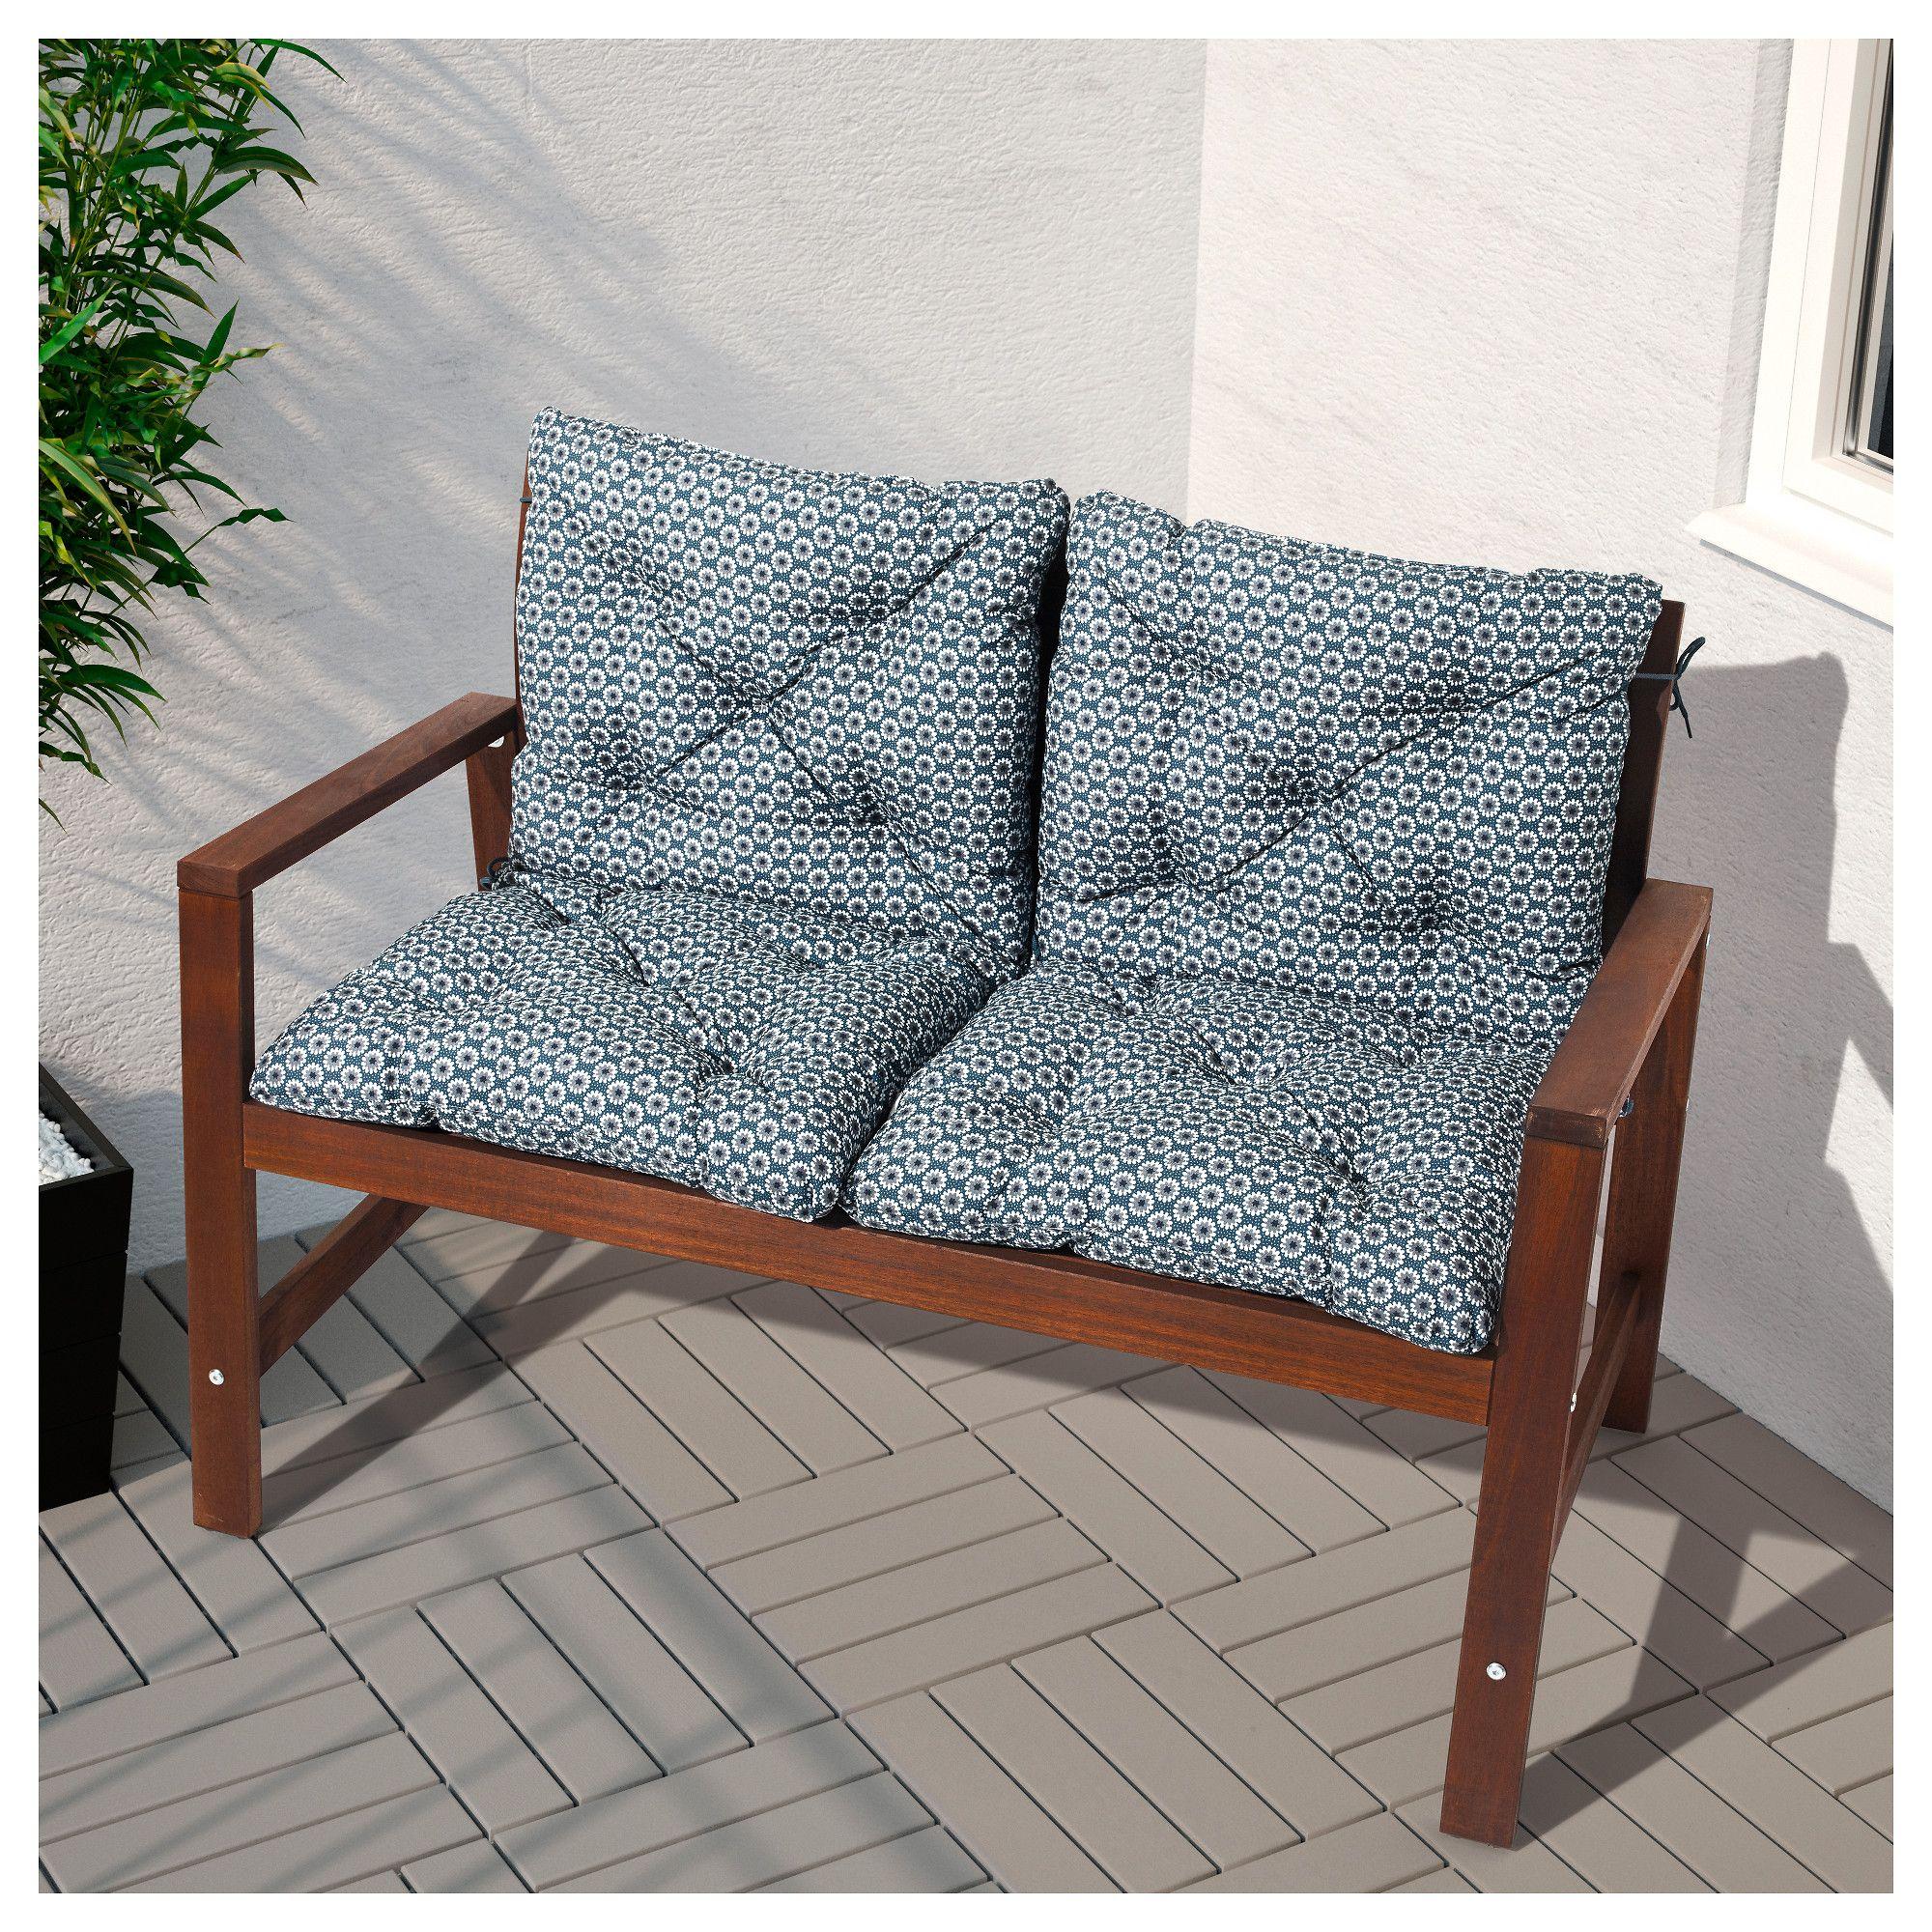 ÄPPLARÖ Bench With Backrest, Outdoor